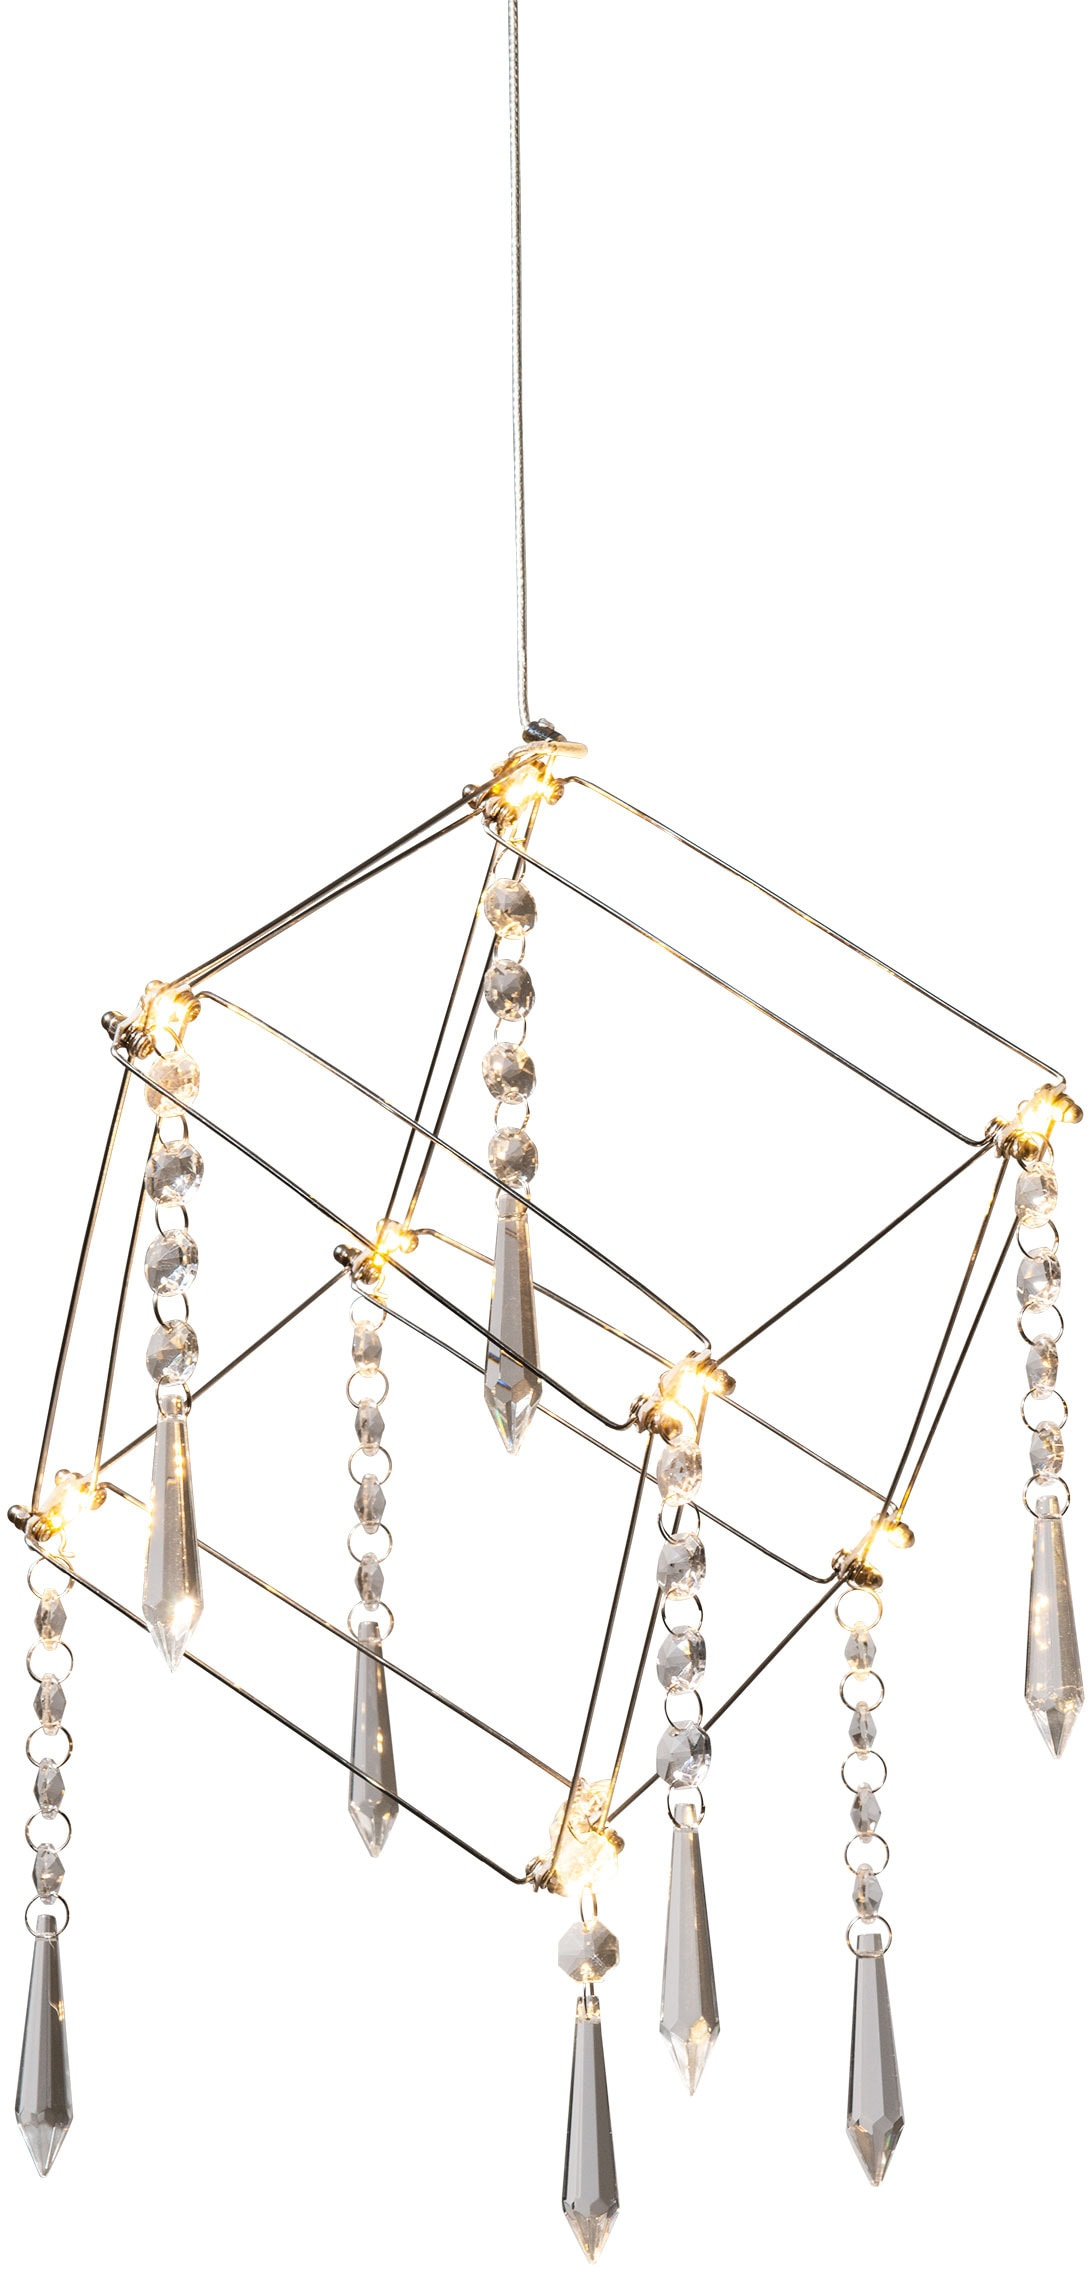 näve LED Pendelleuchte Araneus, LED-Board, 1 St., Warmweiß, LED Hängelampe, LED Hängeleuchte